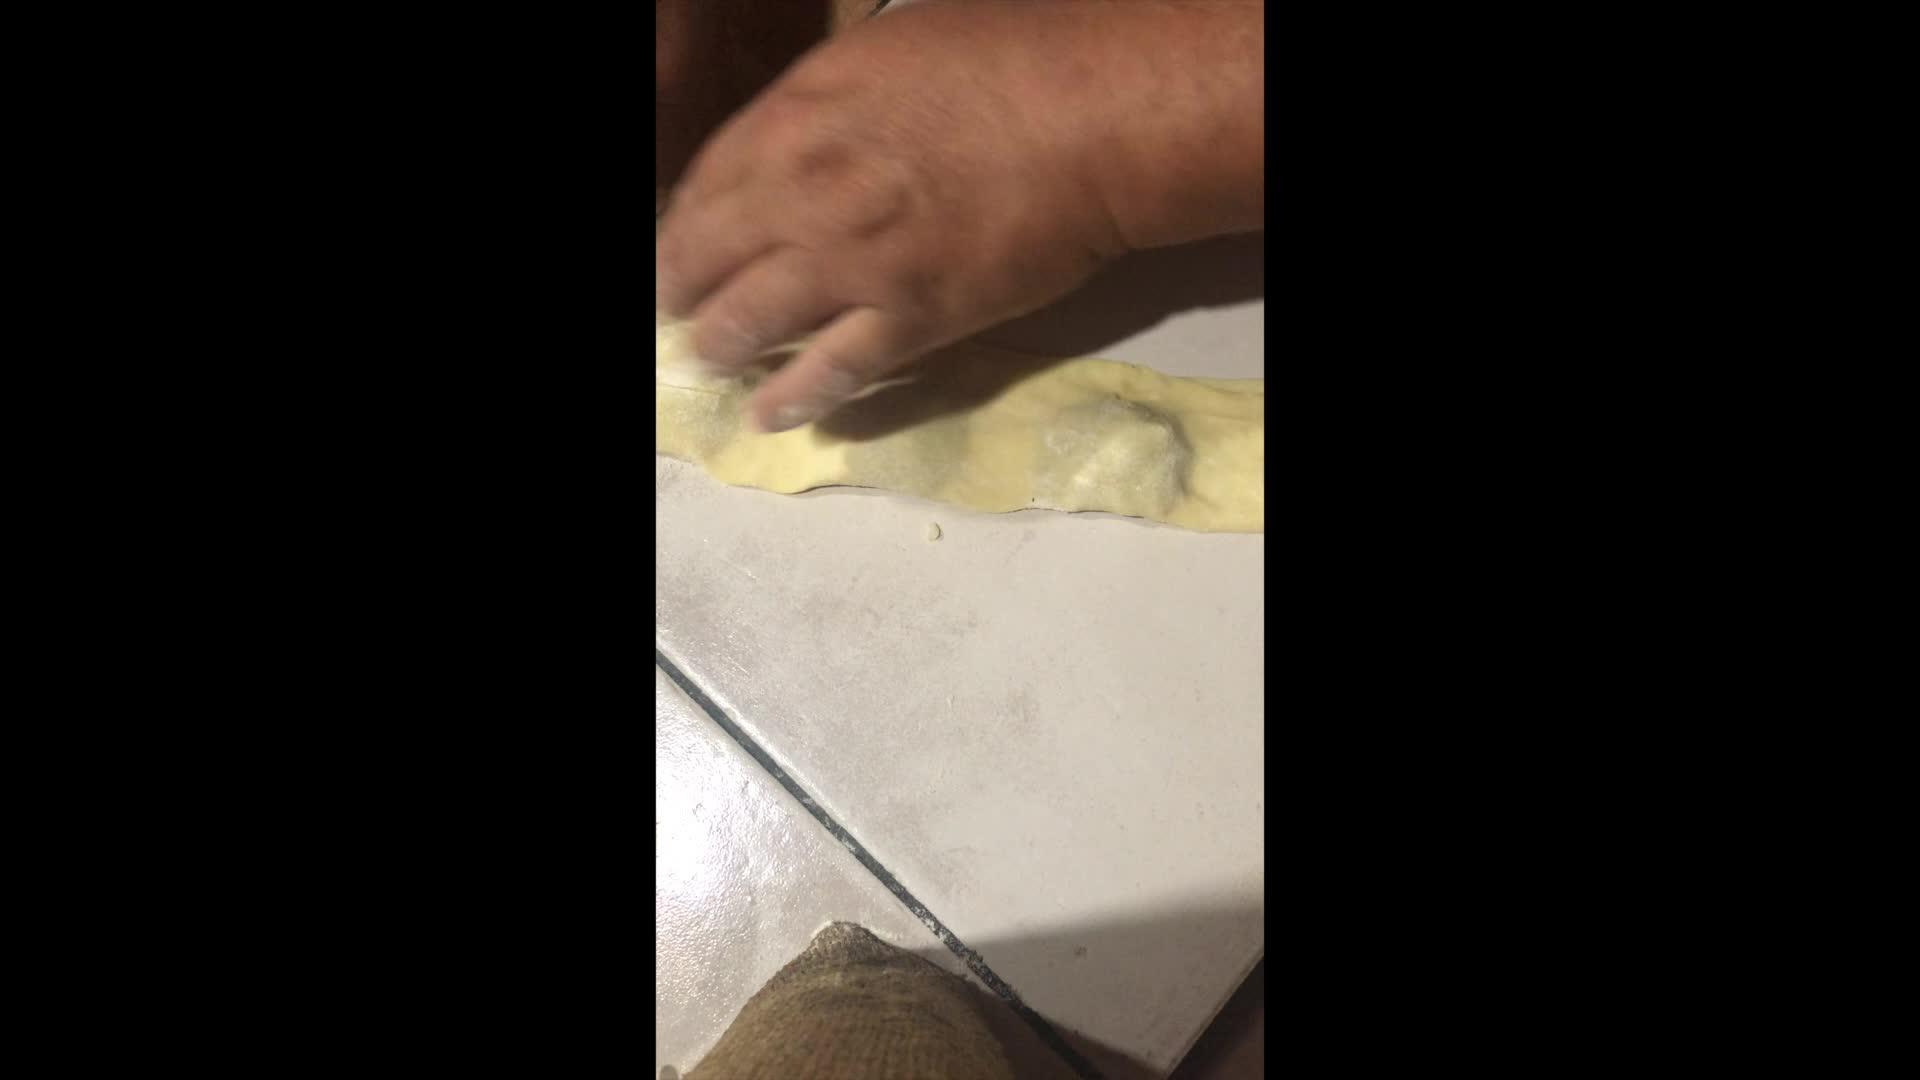 COCINA 2 - TP: Pastas Frescas Rellenas